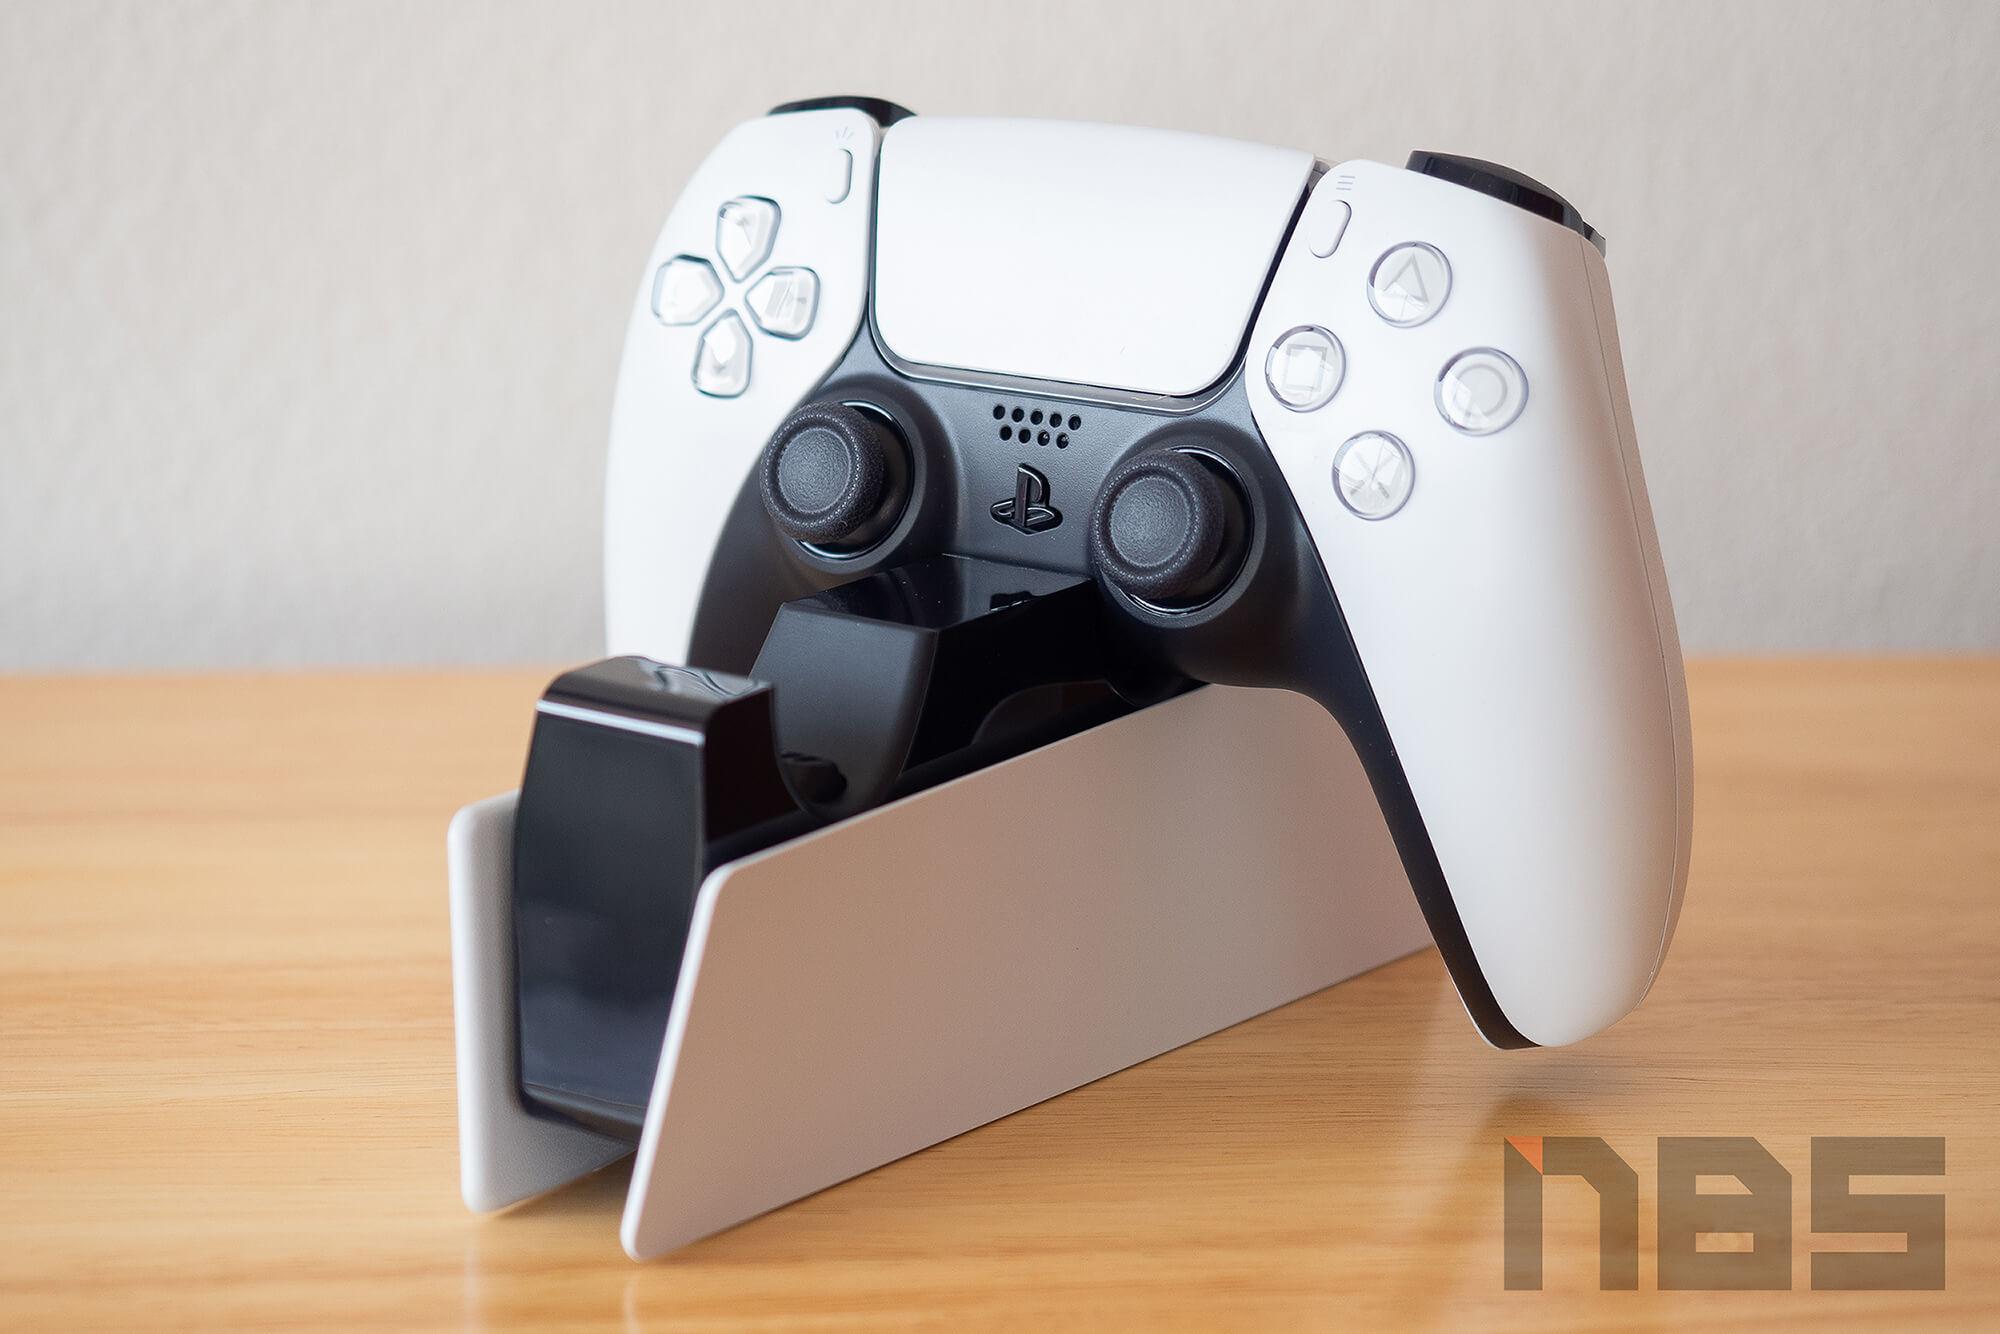 Review PlayStation 5 DualSense Charging Station NotebookSPEC 11